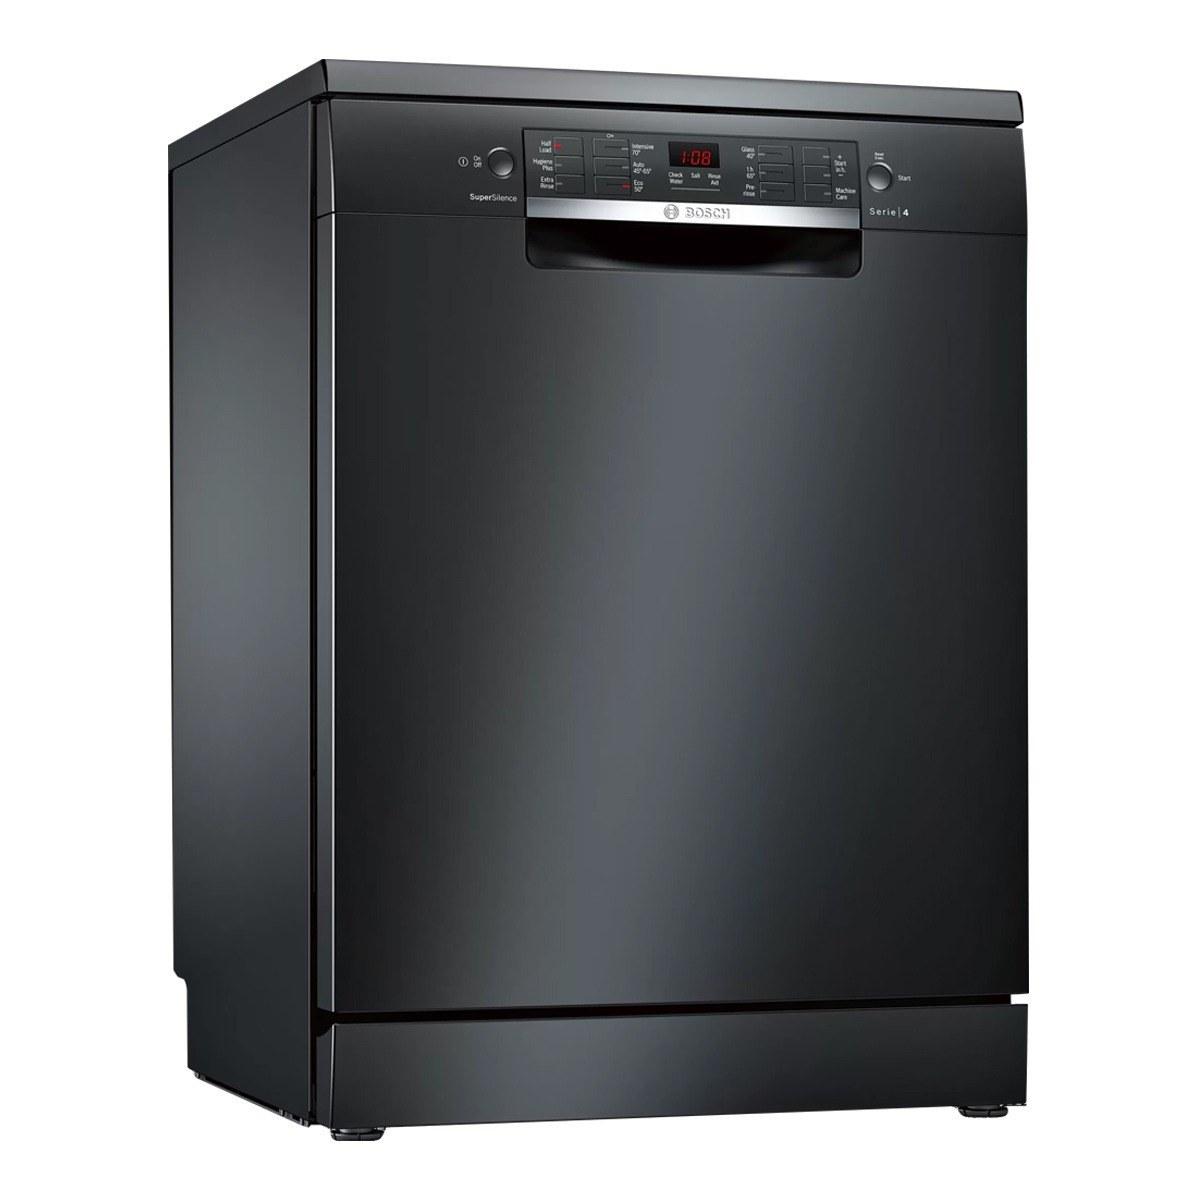 تصویر ماشین ظرفشویی بوش مدل SMS46NI01B / SMS46NW01B BOSCH dishwasher SMS46NB01B